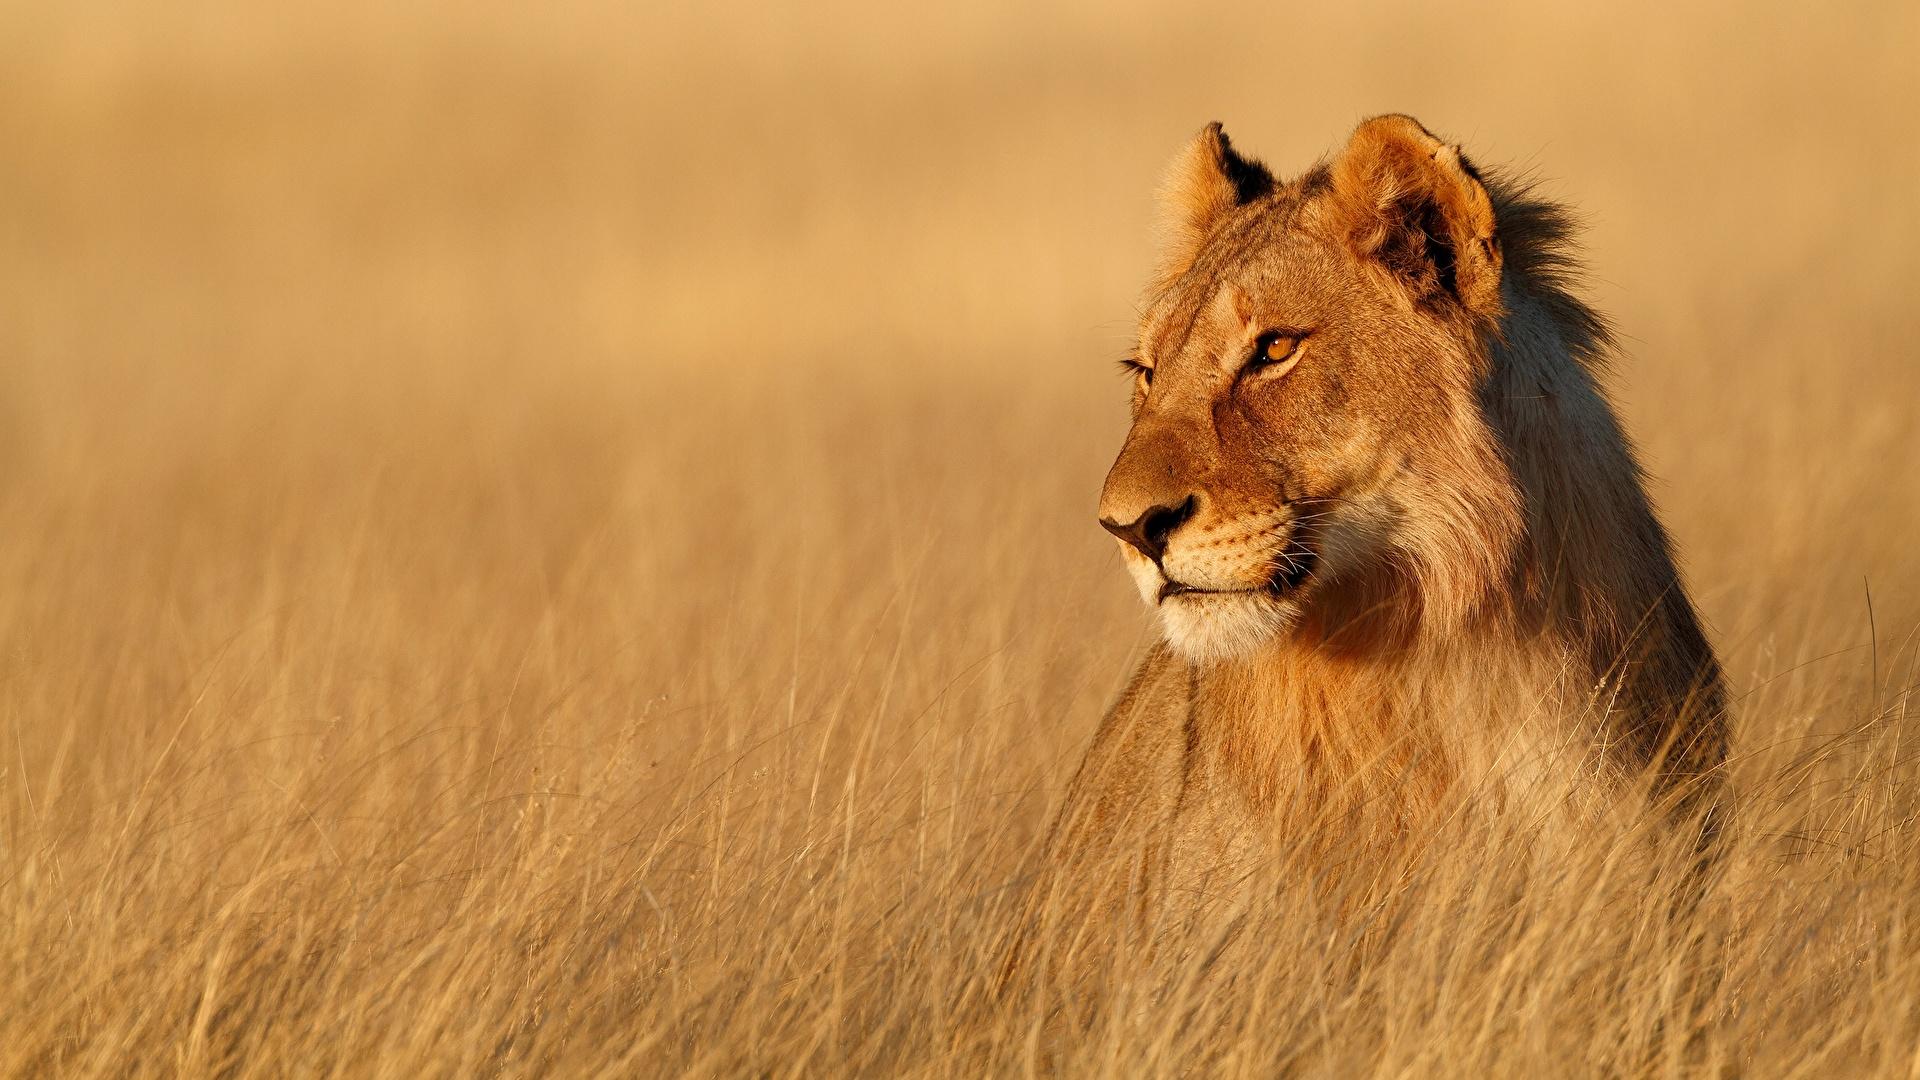 Lions_Lioness_deoadventure